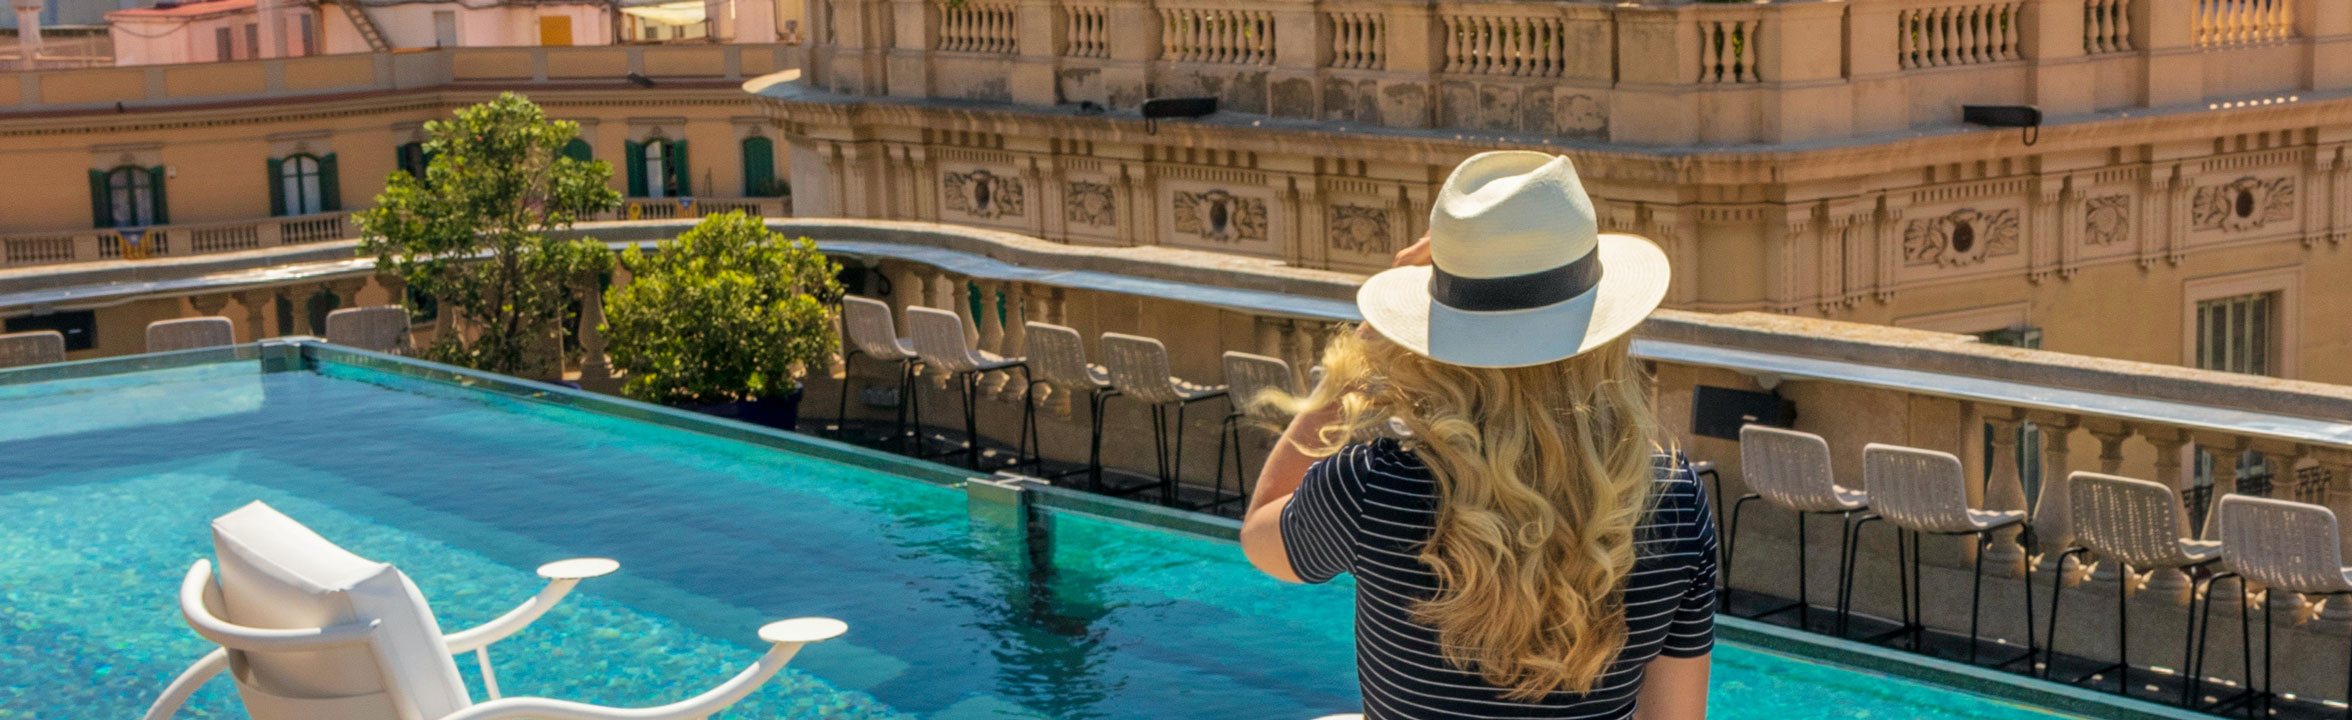 Barcelona hotel, woman by balcony pool